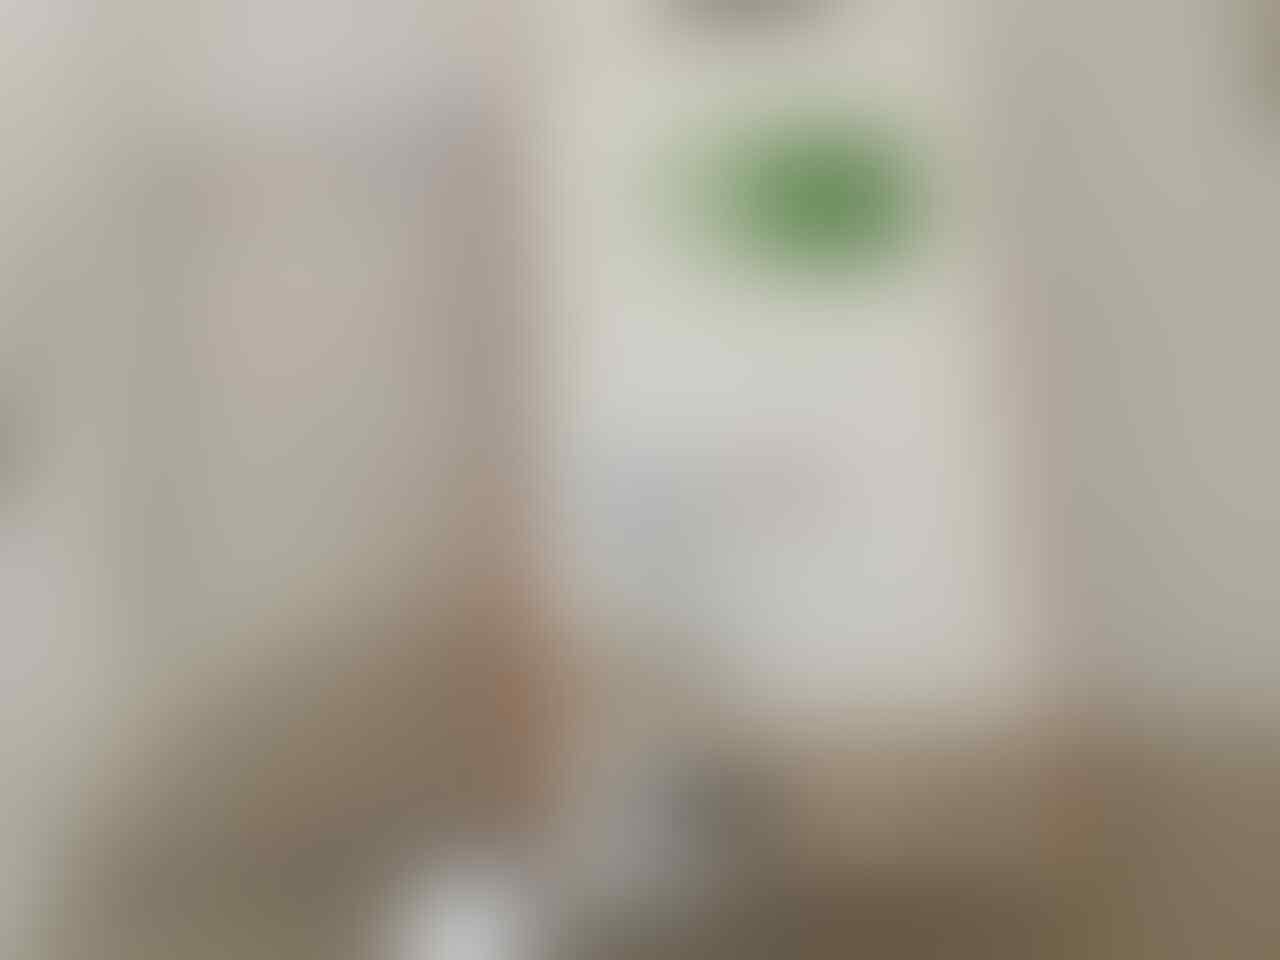 SPIGEN CASE LIQUID CRYSTAL FOR SAMSUNG NOTE 8 ORIGINAL MURAAAHH 100 SAJA [MALANG]